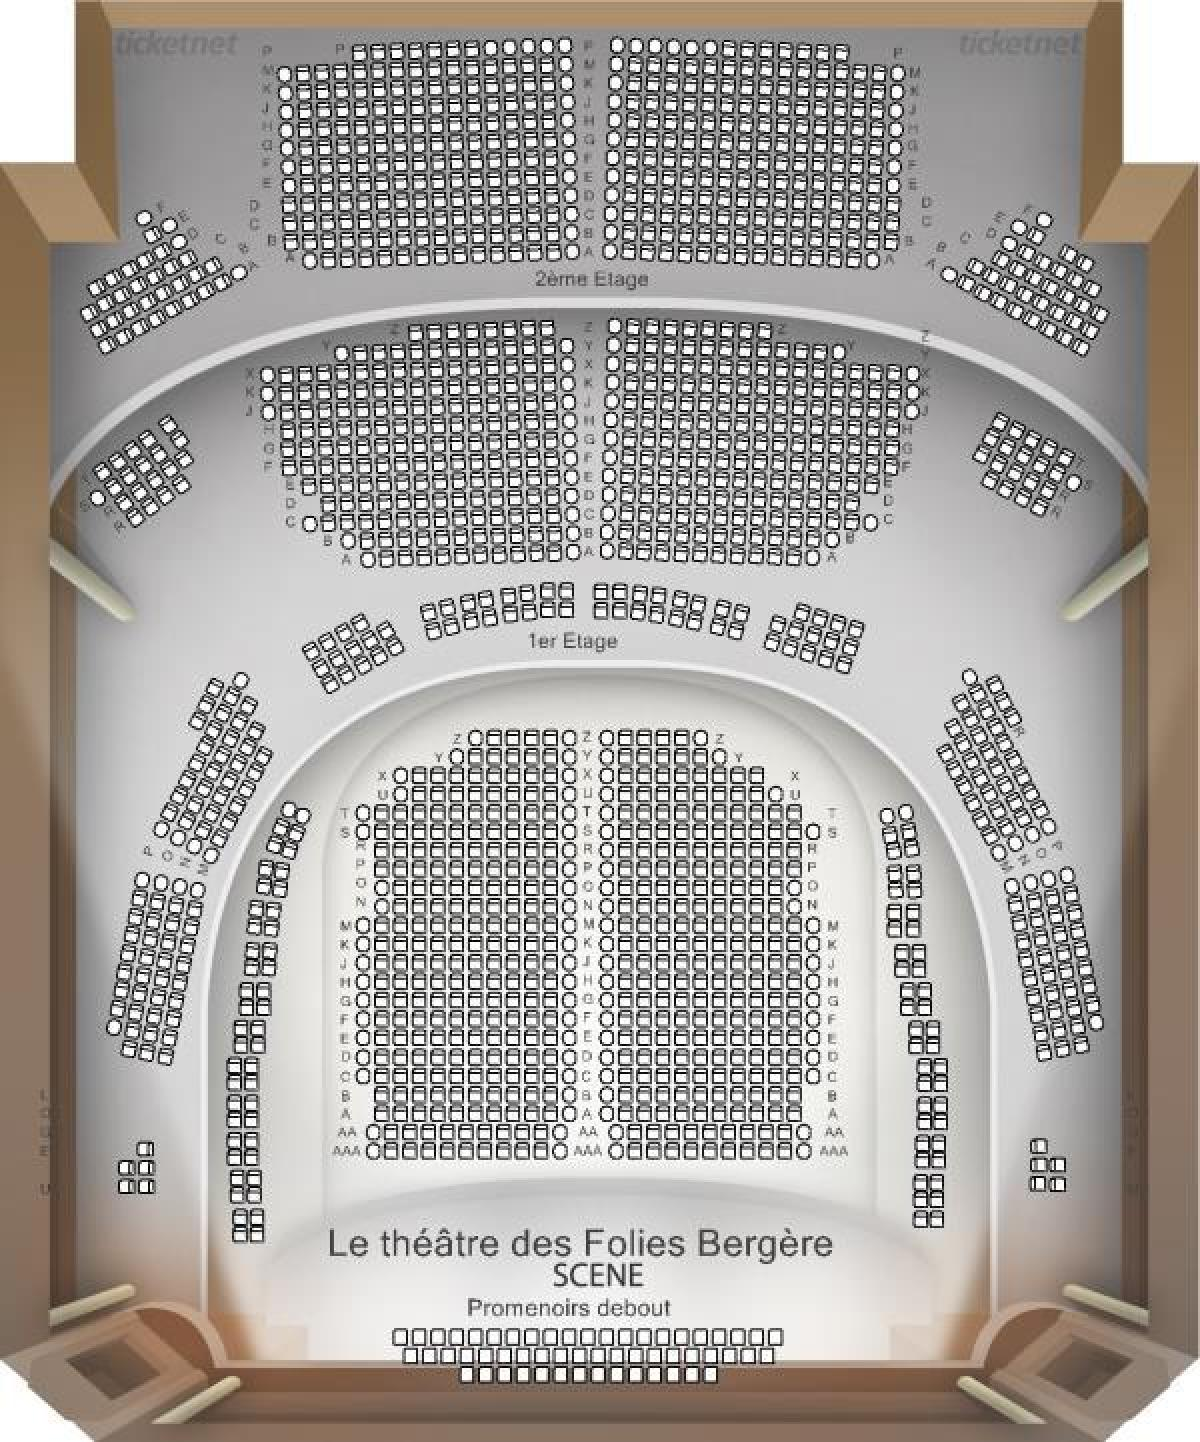 Carte De La Folie De La Vierge : carte, folie, vierge, Folies, Bergere, Carte, (France)